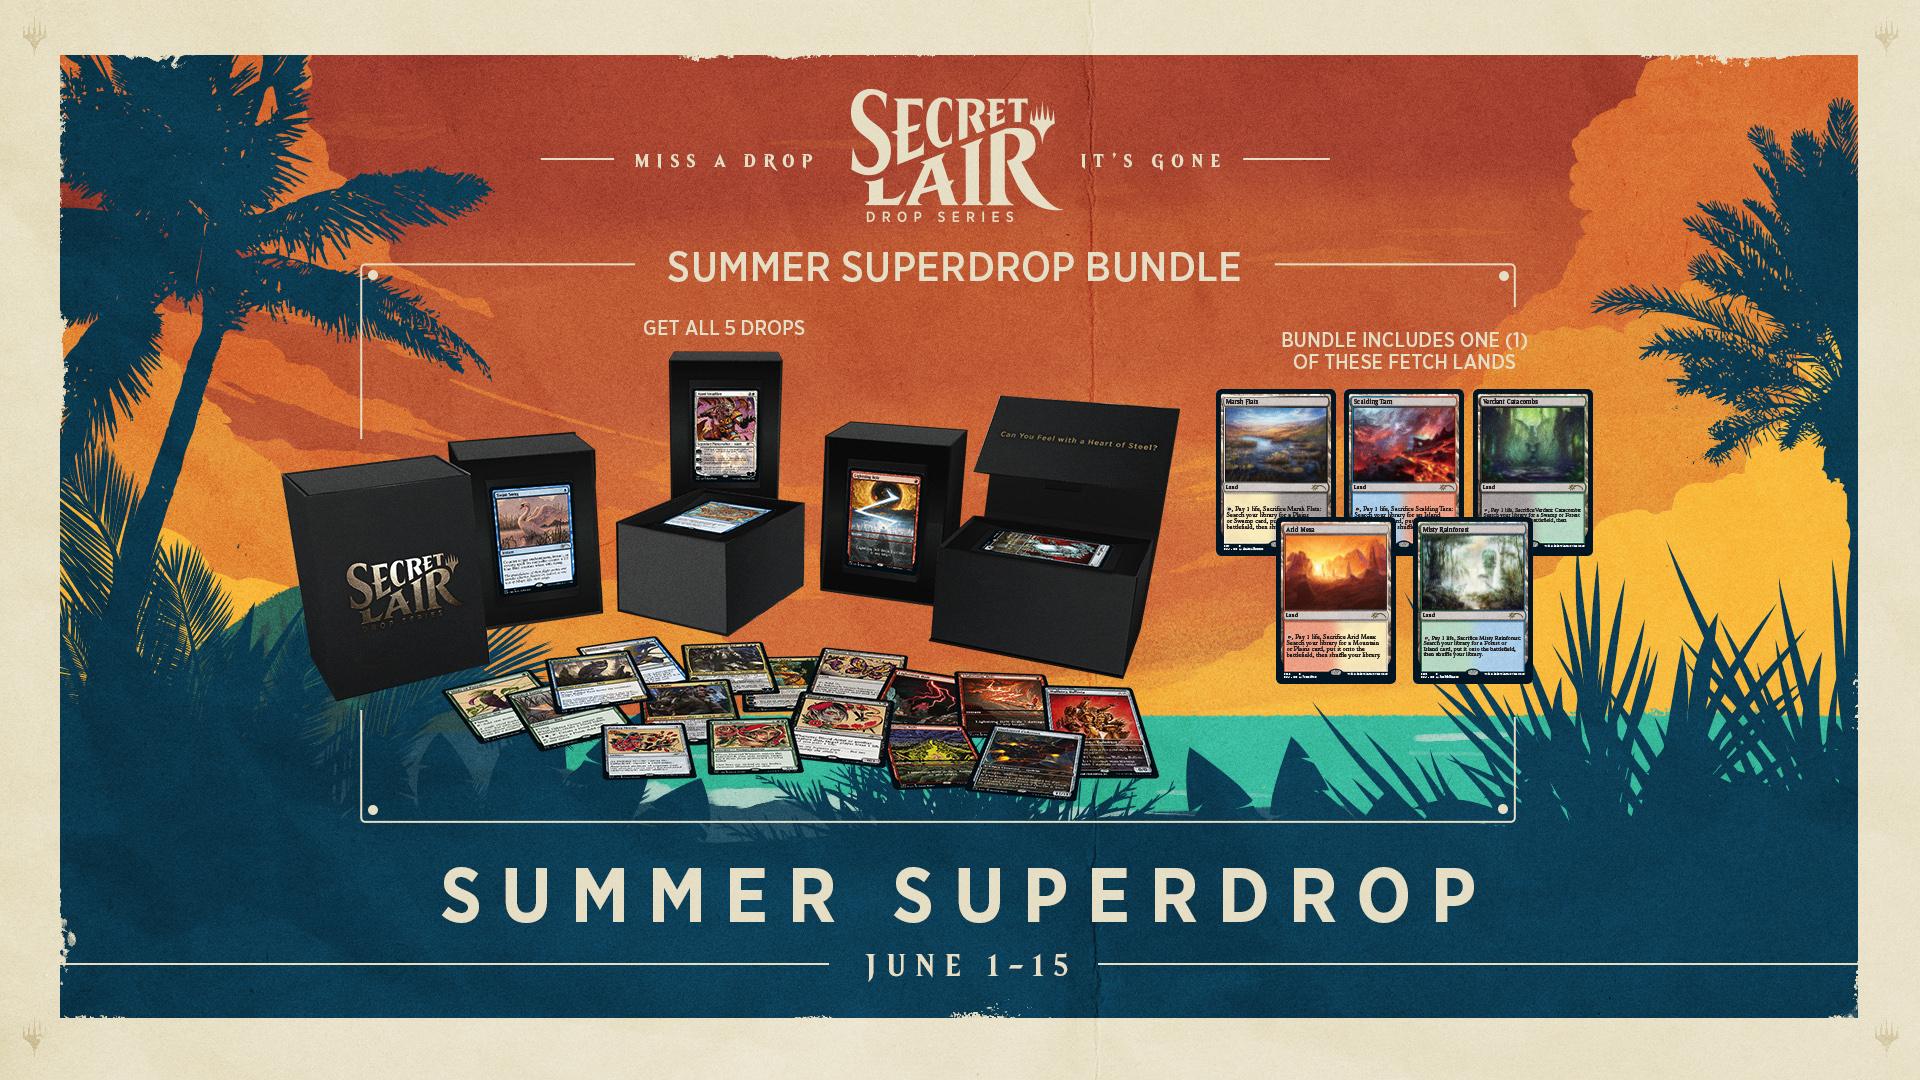 Capacity : SL Summer Superdrop